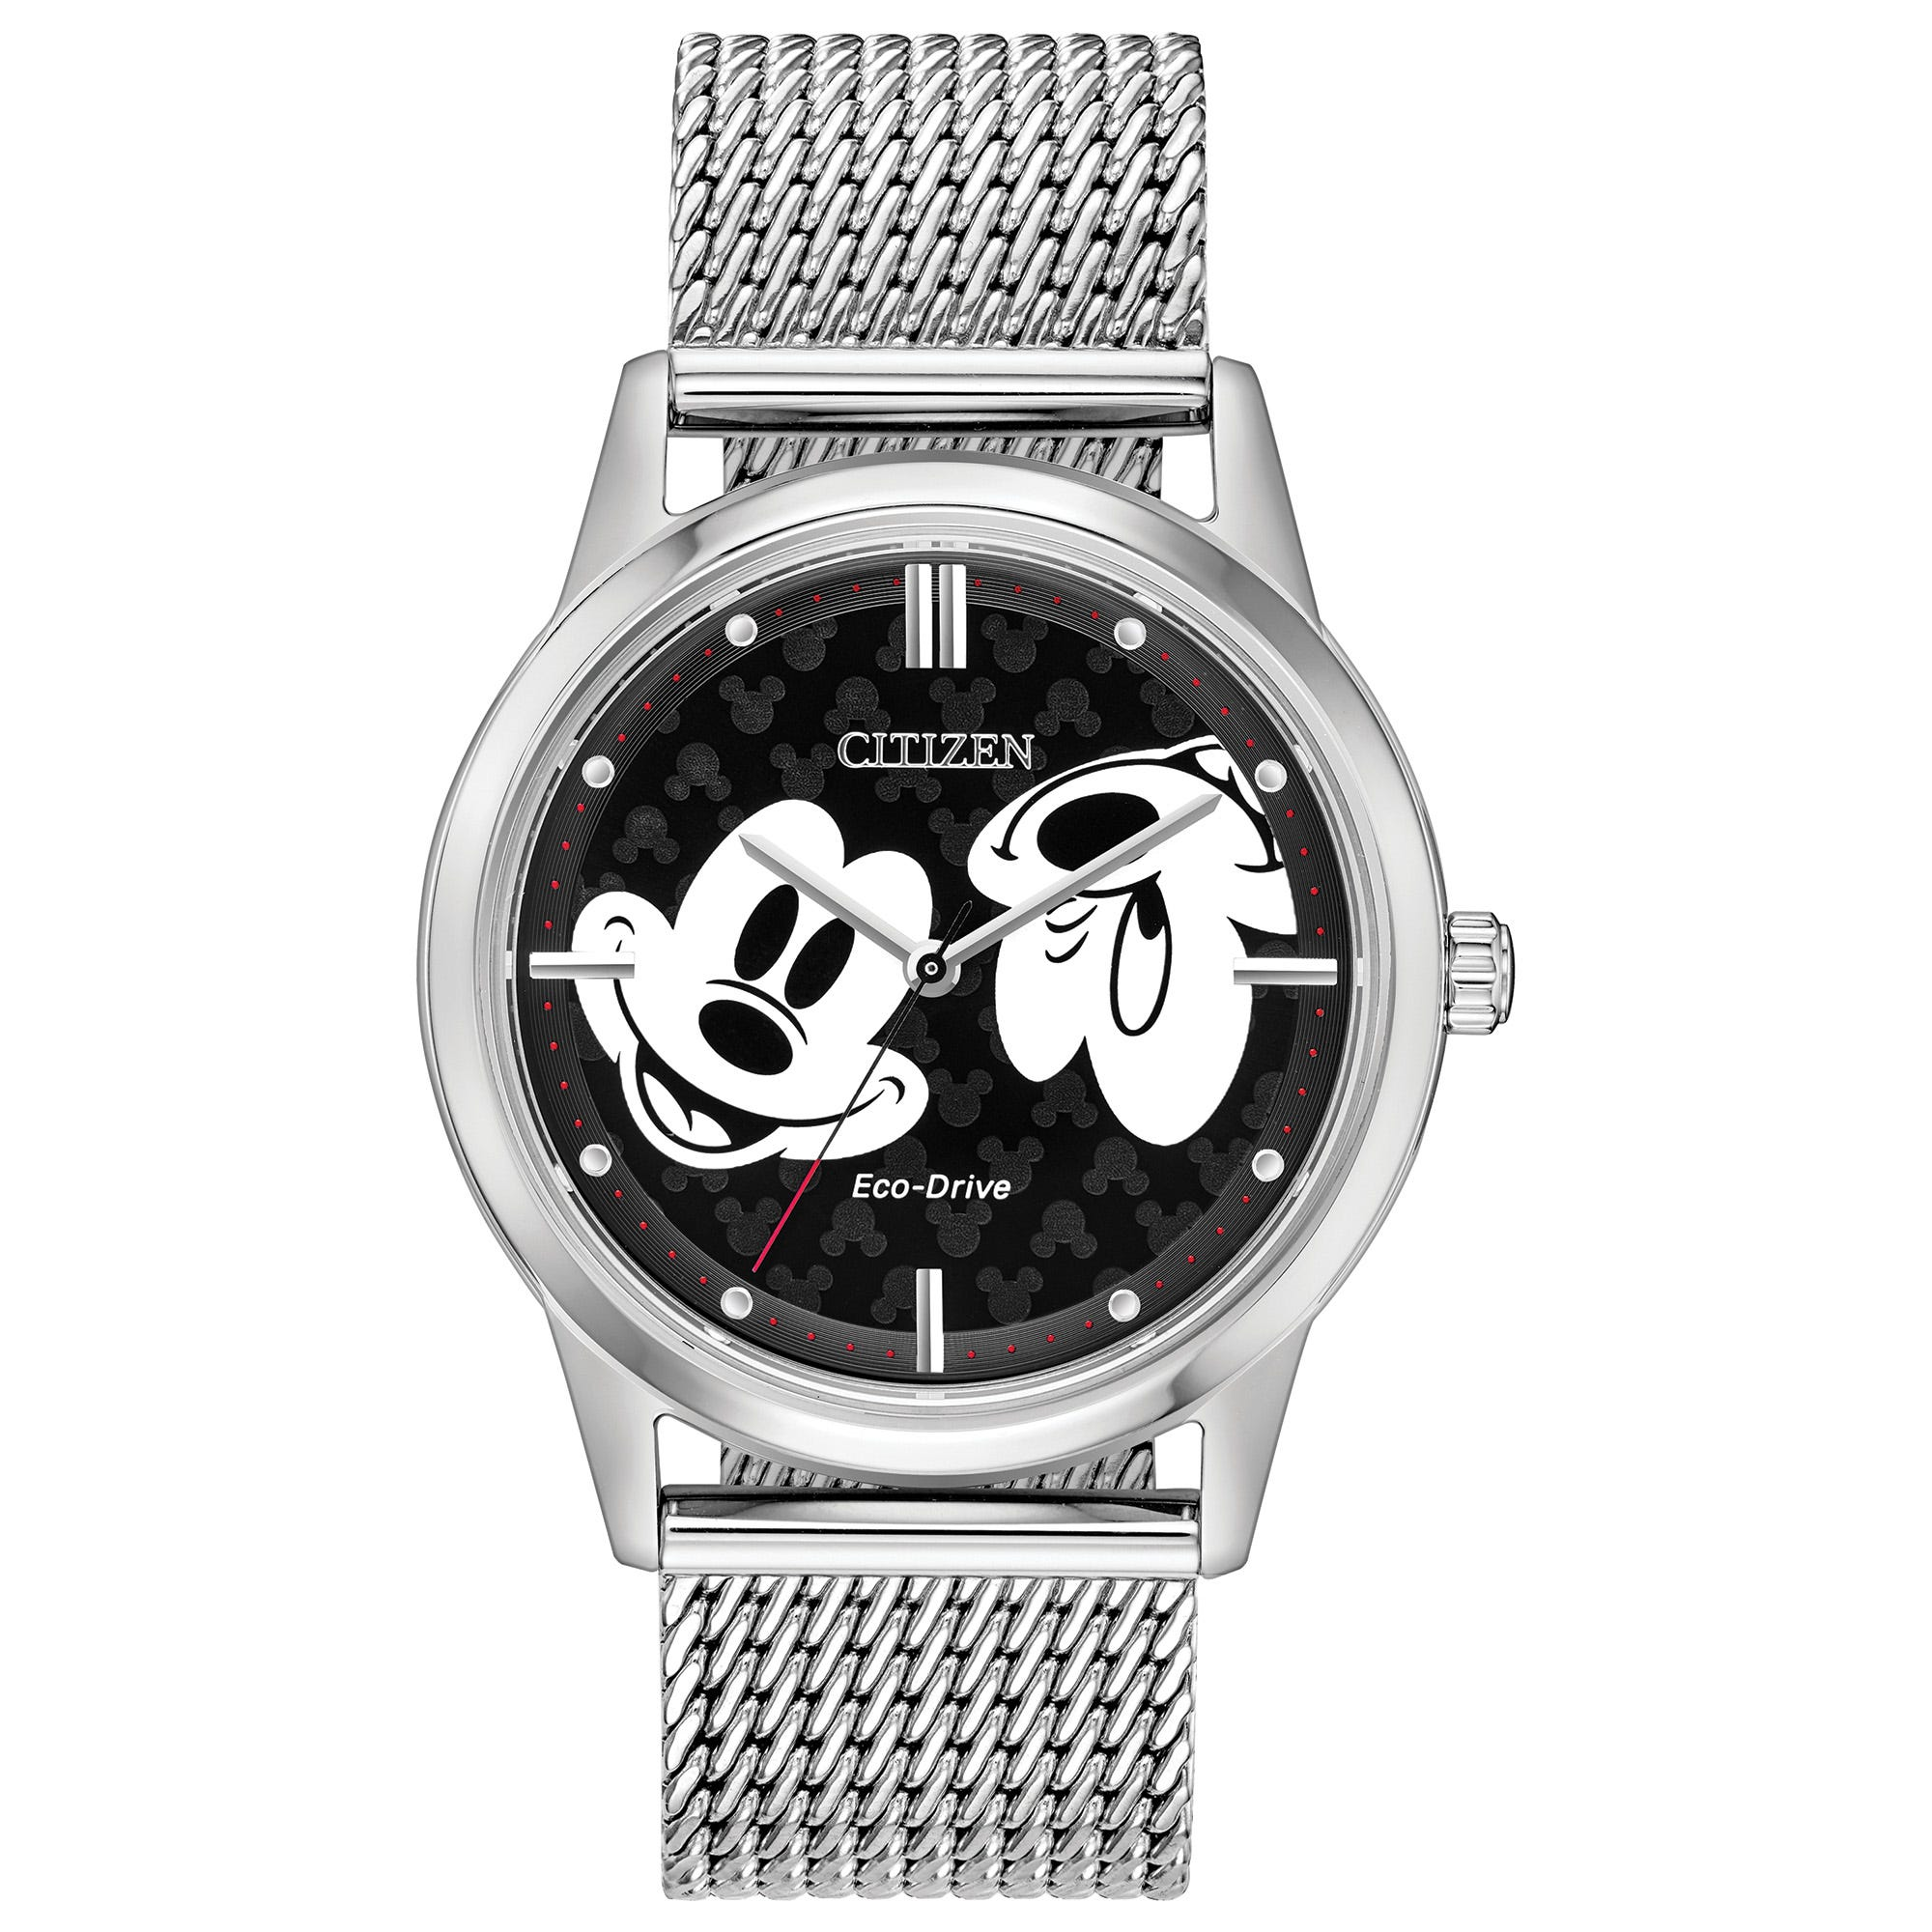 Citizen Mickey Mouse Disney Watch FE7060-56W